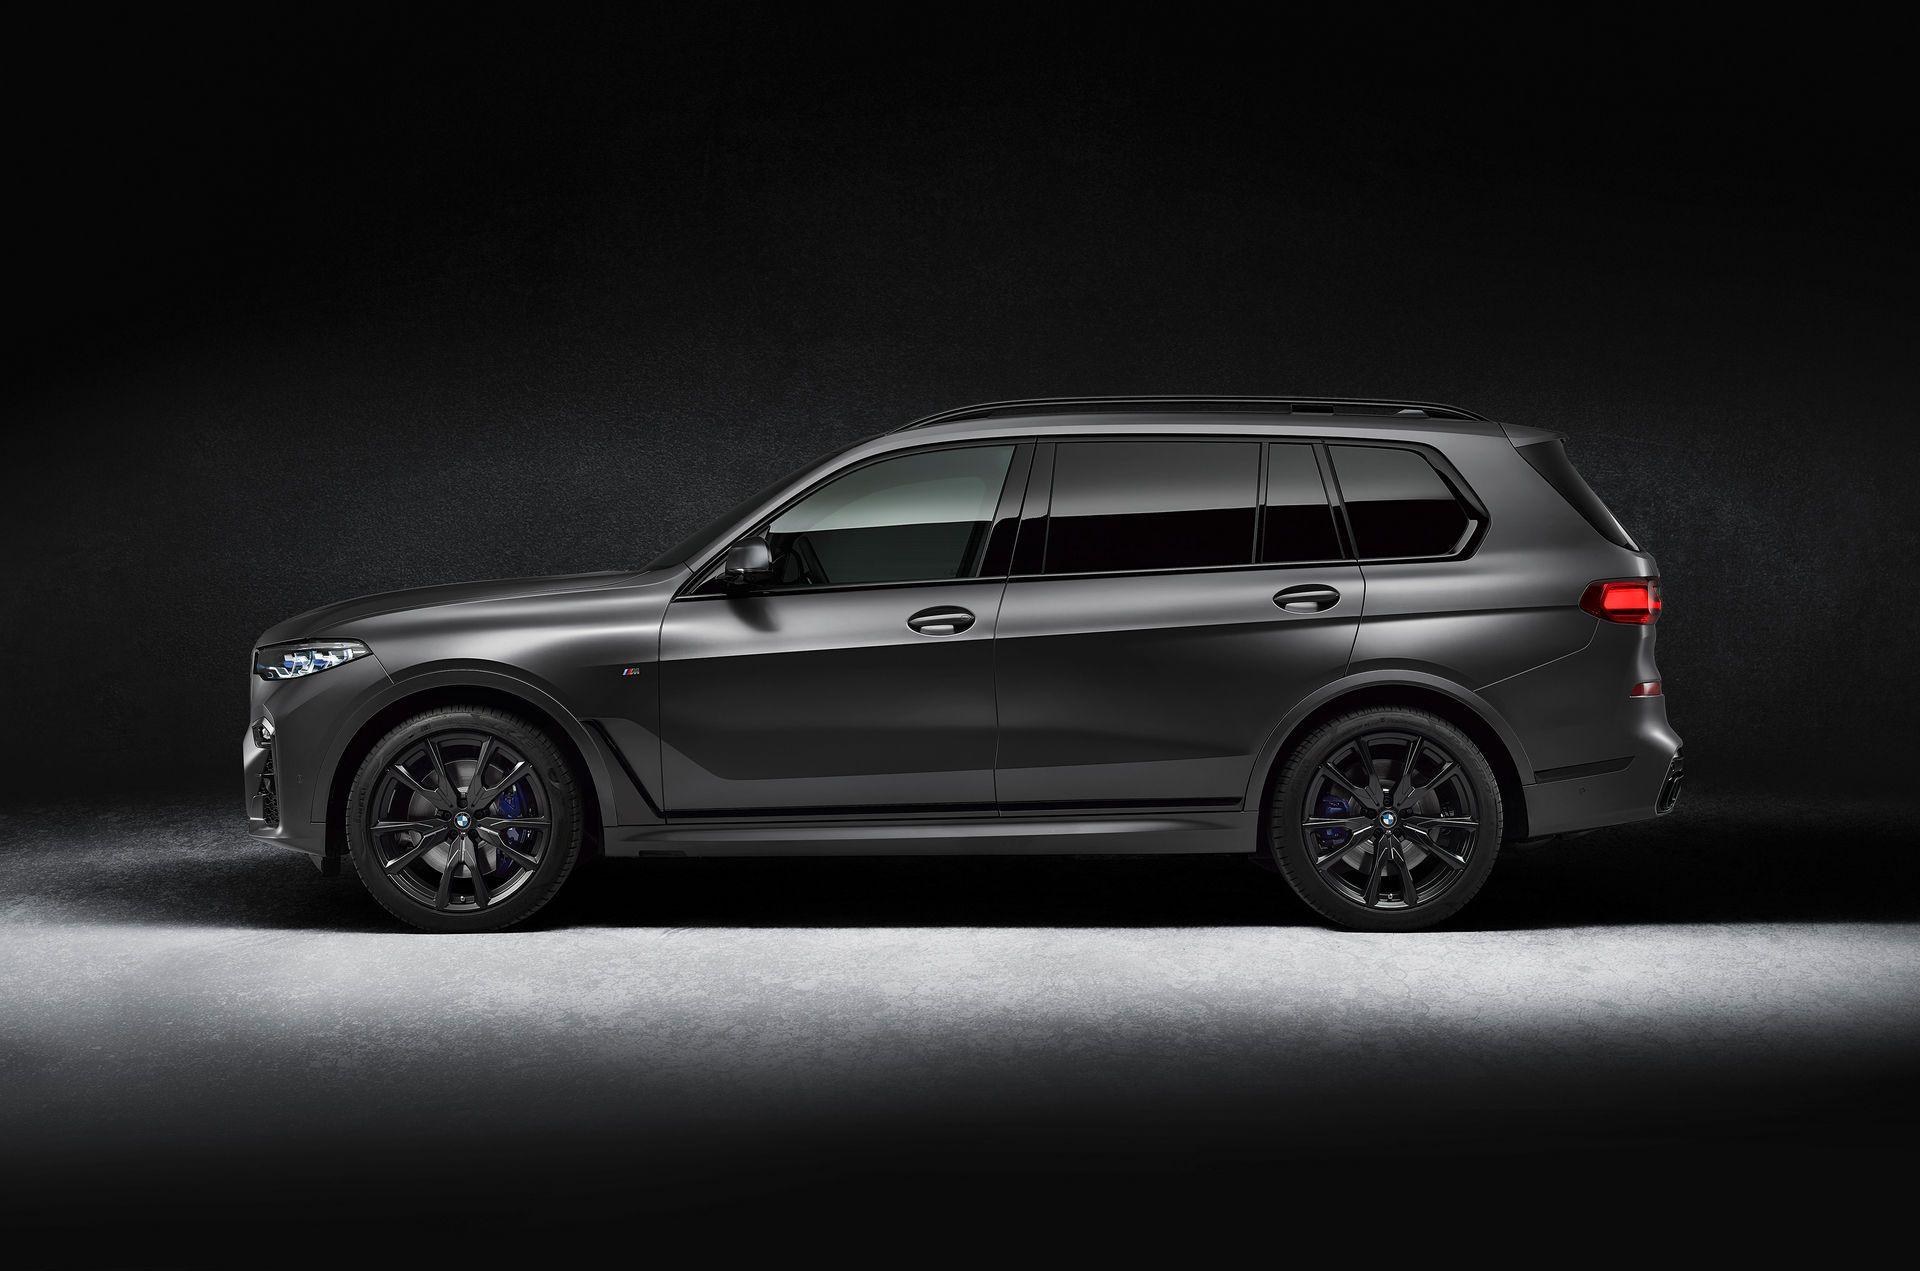 BMW-X7-Dark-Shadow-Edition-4